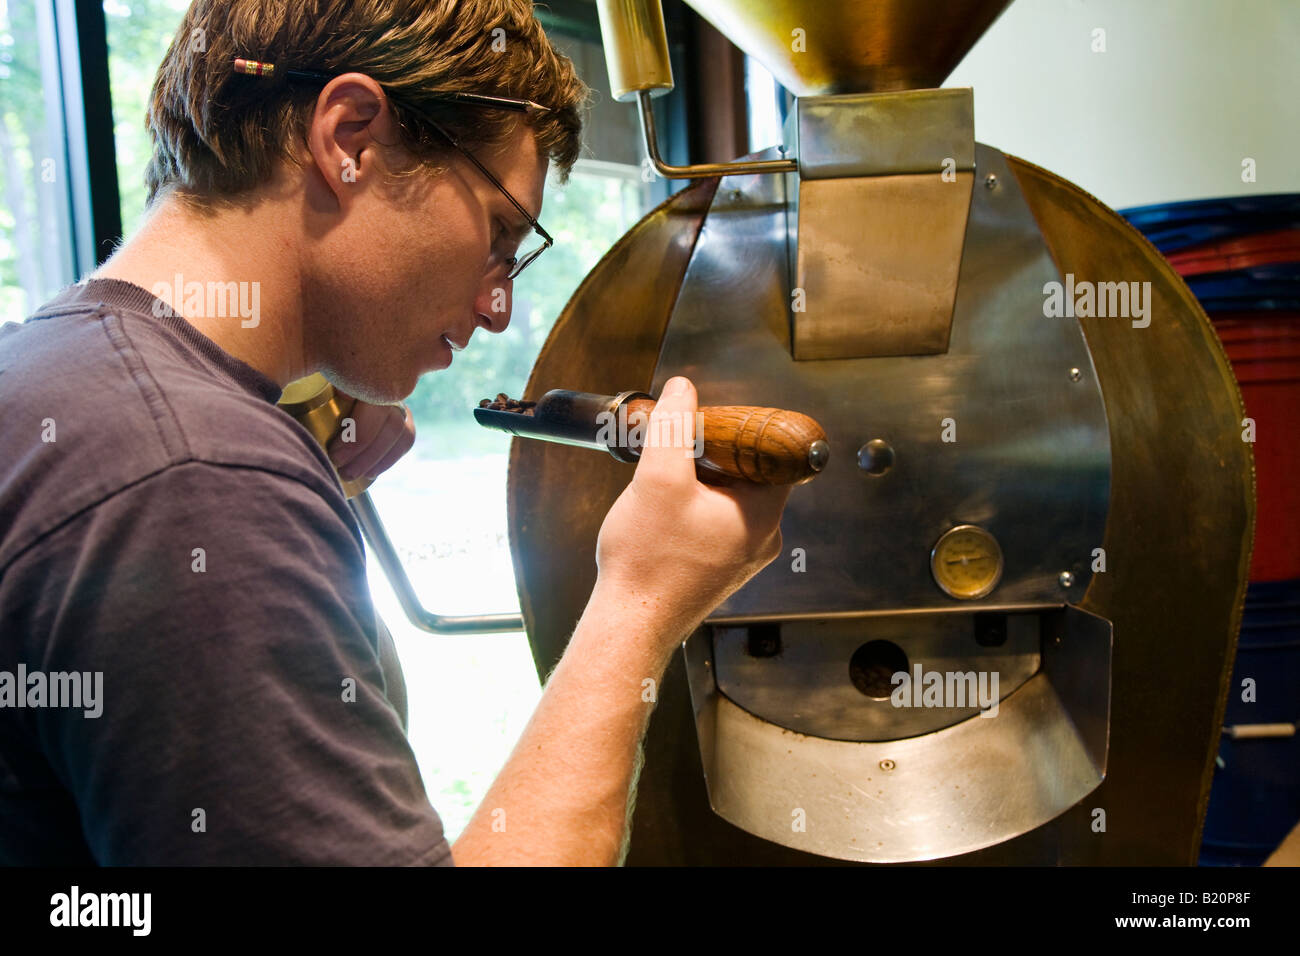 Coffee Roasting Stock Photos & Coffee Roasting Stock Images